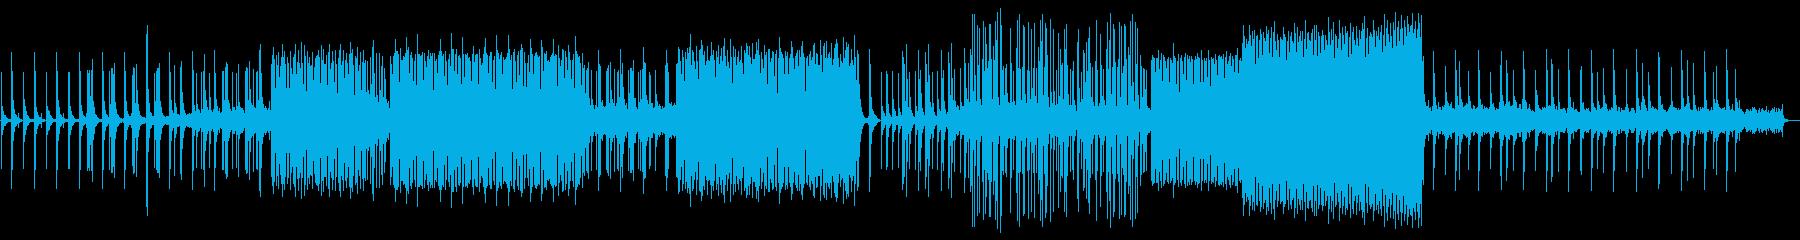 Atama no nakaの再生済みの波形